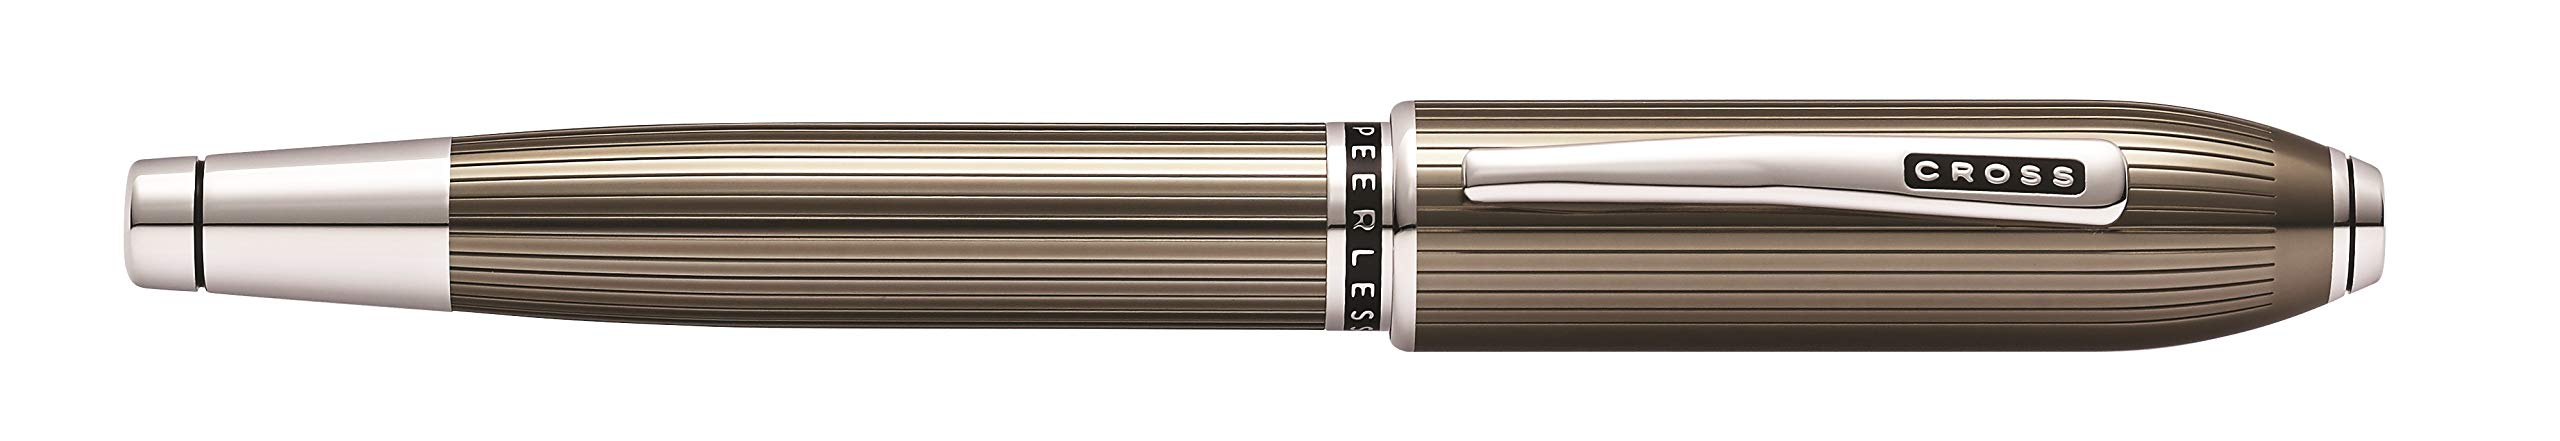 Cross Peerless Translucent Titanium Gray Selectip Rollerball Pen by Cross (Image #3)